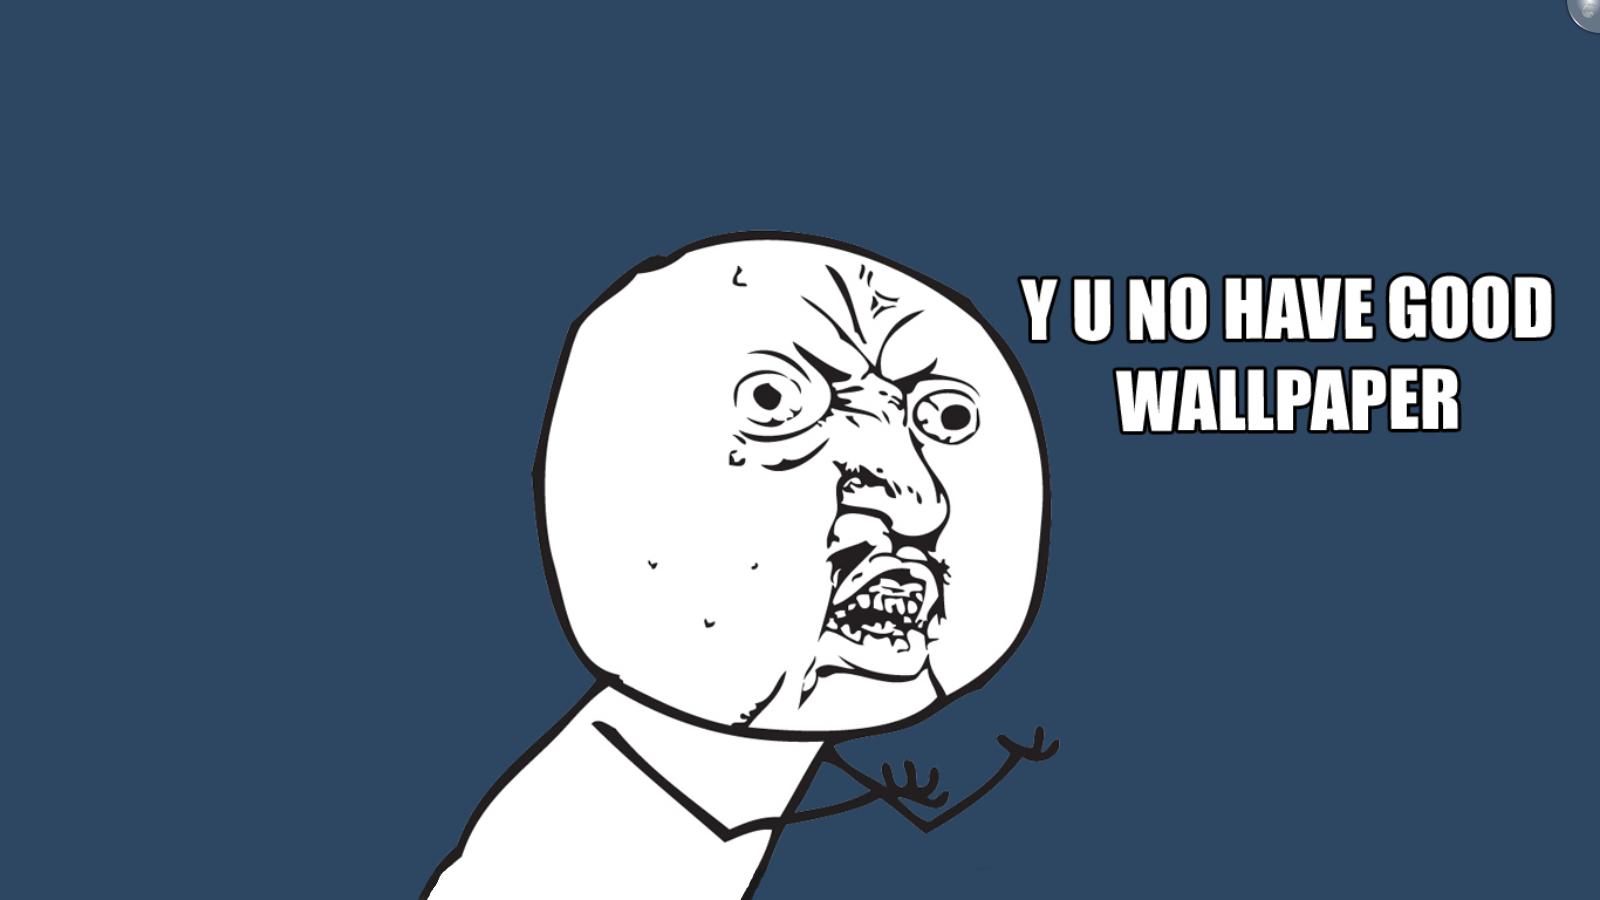 Humor Meme Wallpaper 1600x900 Humor Meme Wallbase 1600x900